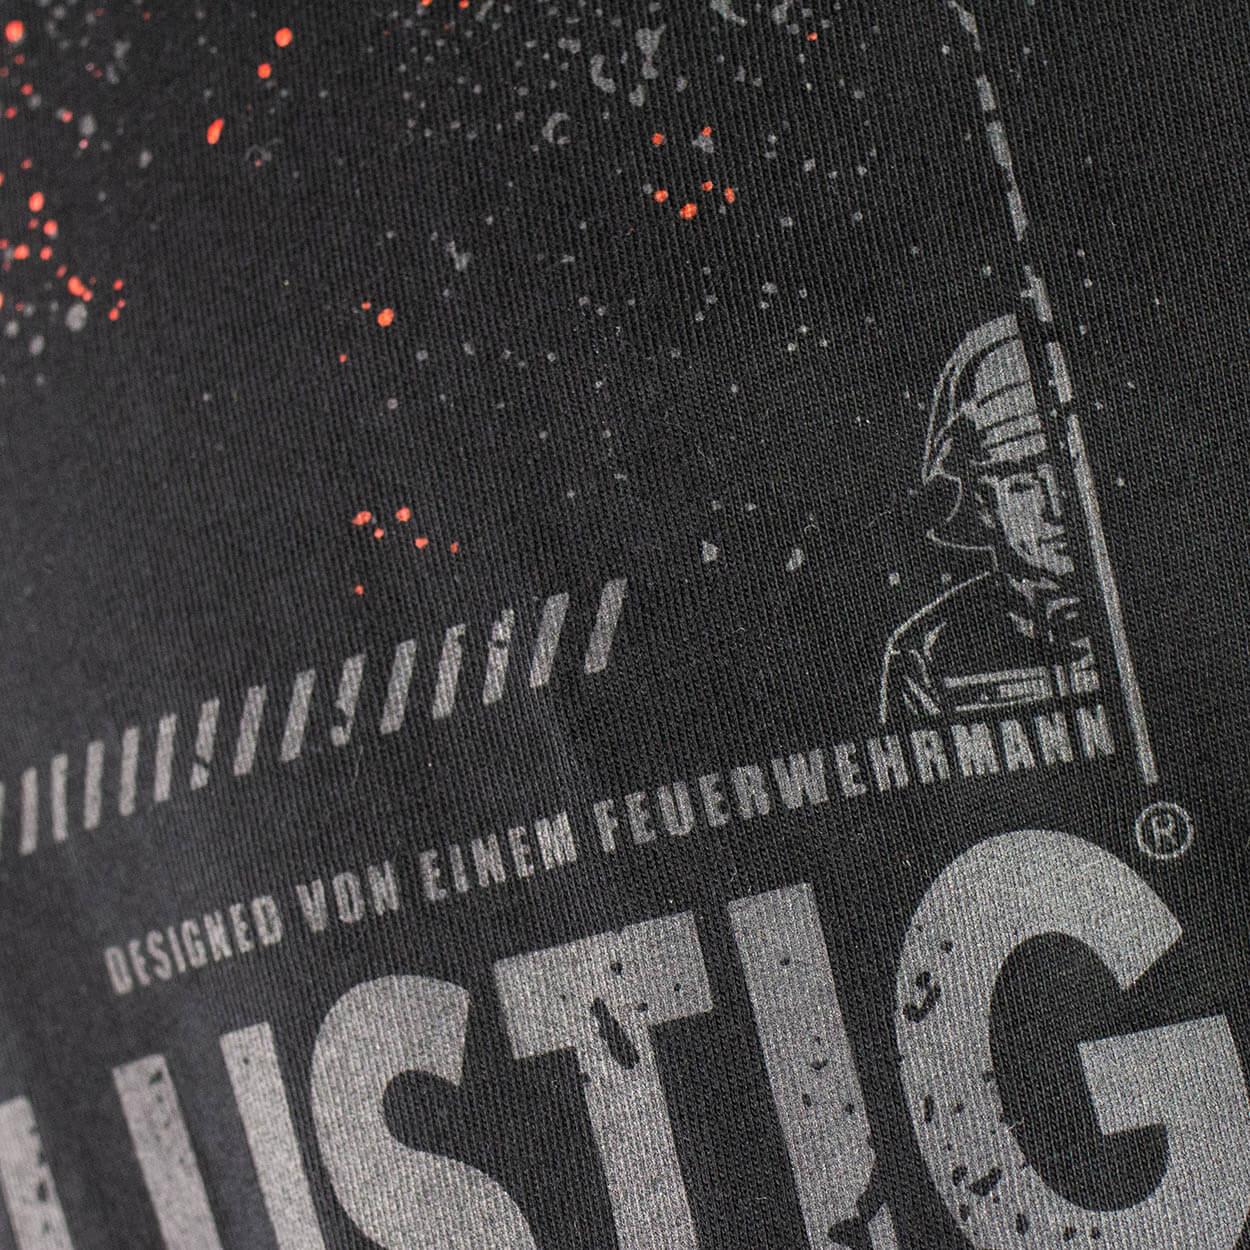 Angriffslustig® Design - Frauen T-Shirt schwarz